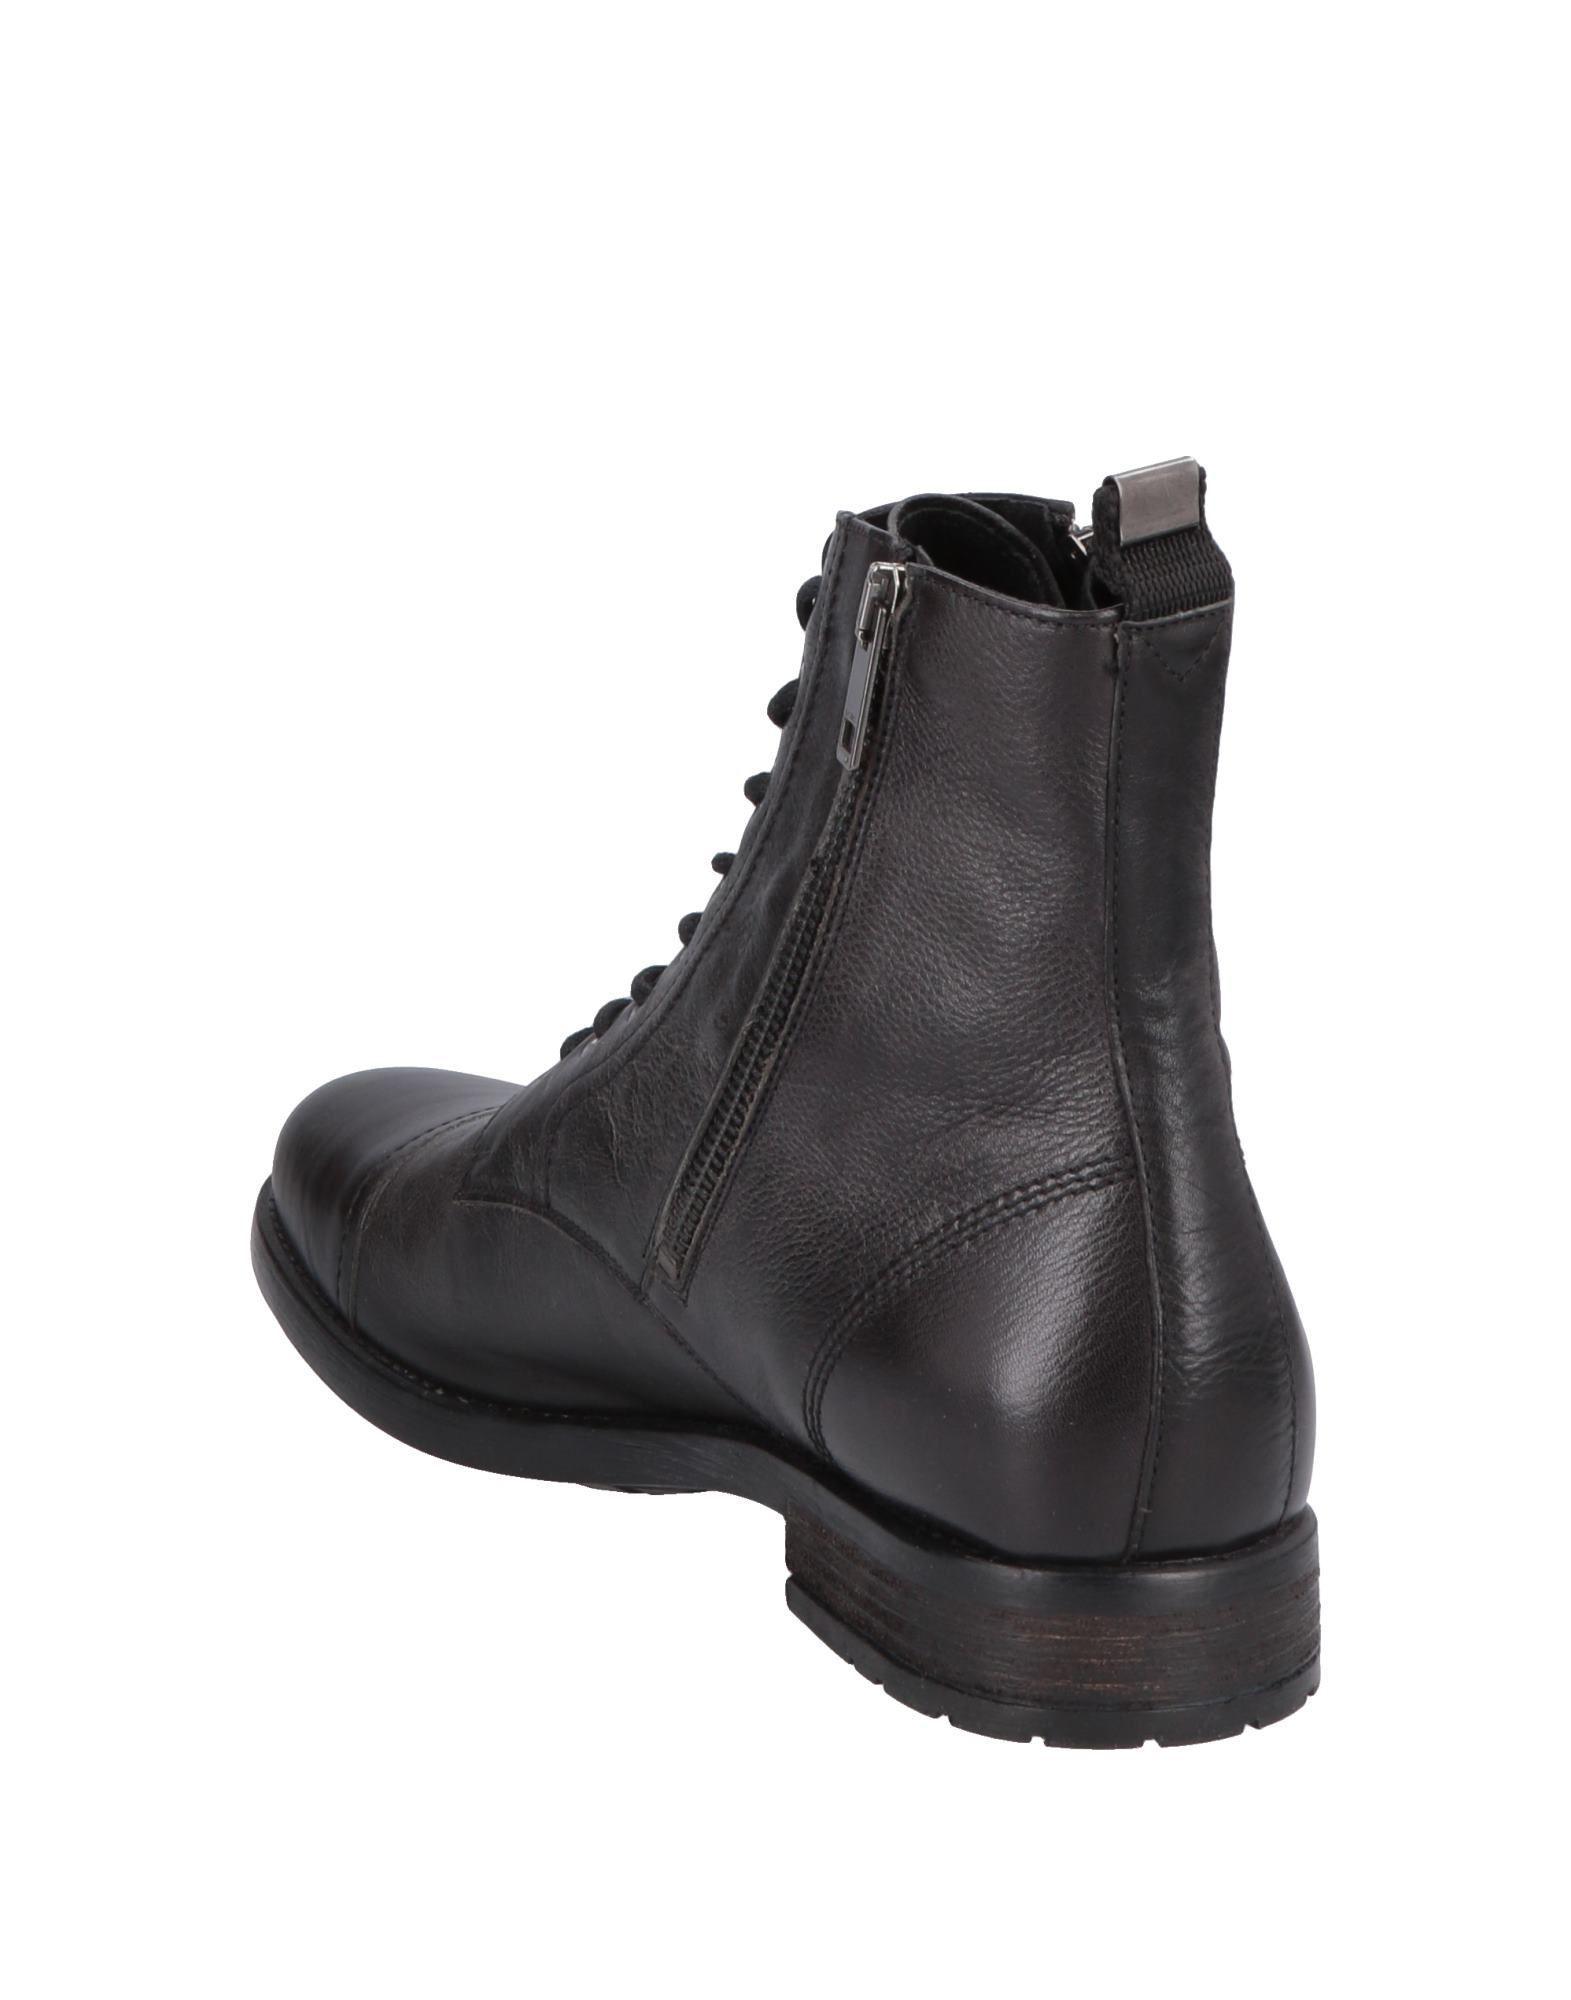 b3e91755b8ce55 Lyst - DIESEL Ankle Boots in Black for Men